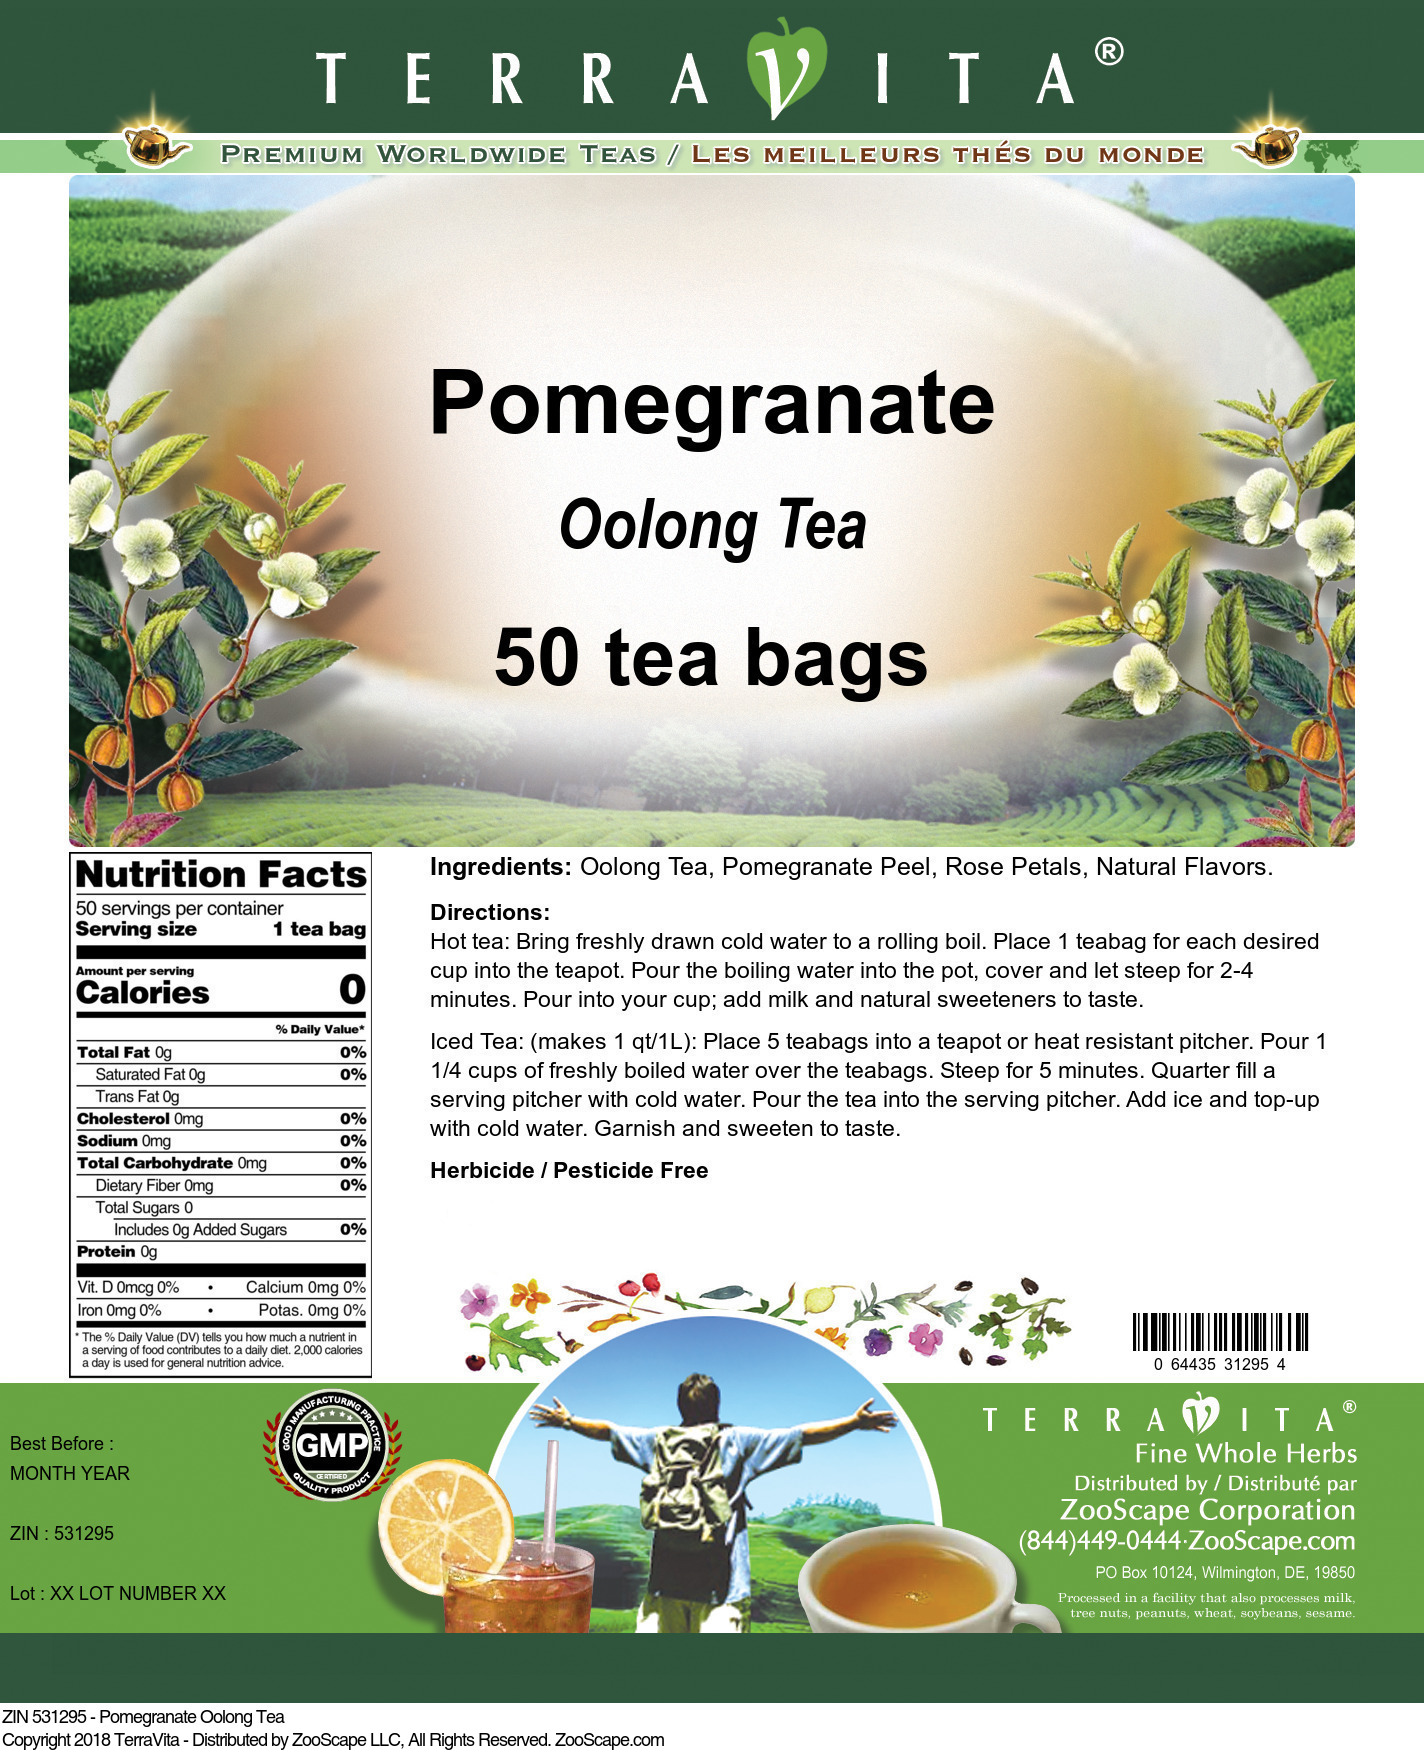 Pomegranate Oolong Tea